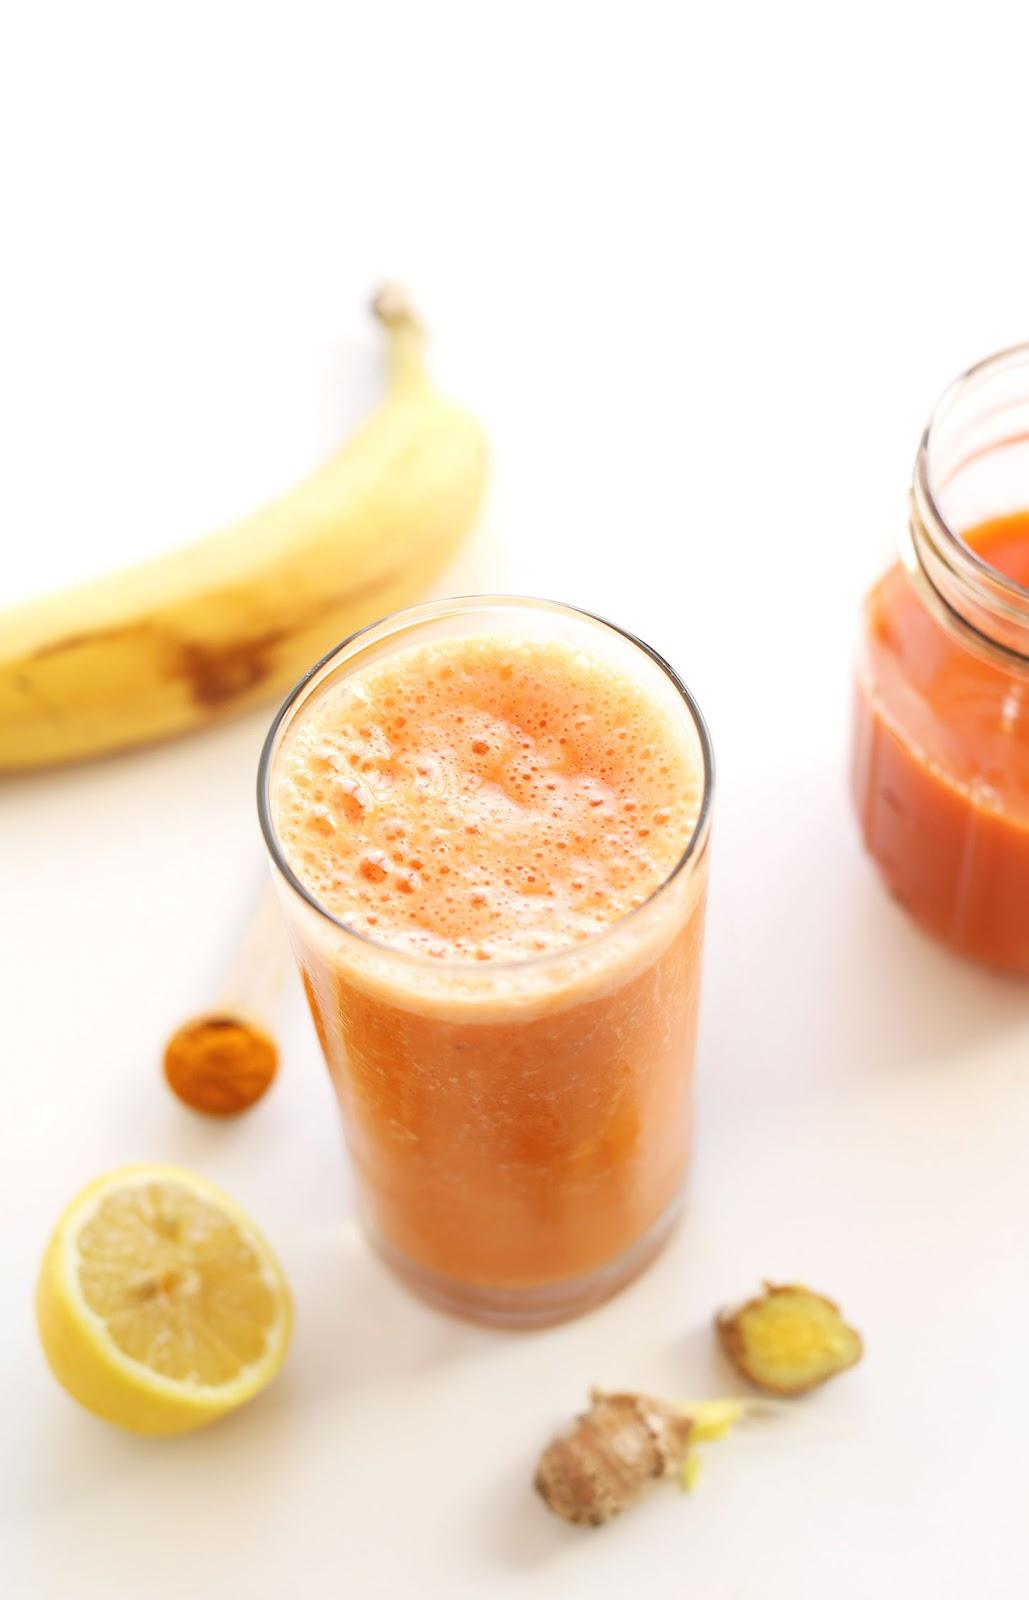 AMAZING-7-ingredient-Carrot-Ginger-Turmeric-Smoothie-Immune-boosting-anti-inflammatory-and-DELICIOUS-vegan-glutenfree-recipe-healthy-smoothie-minimalistbaker.jpg